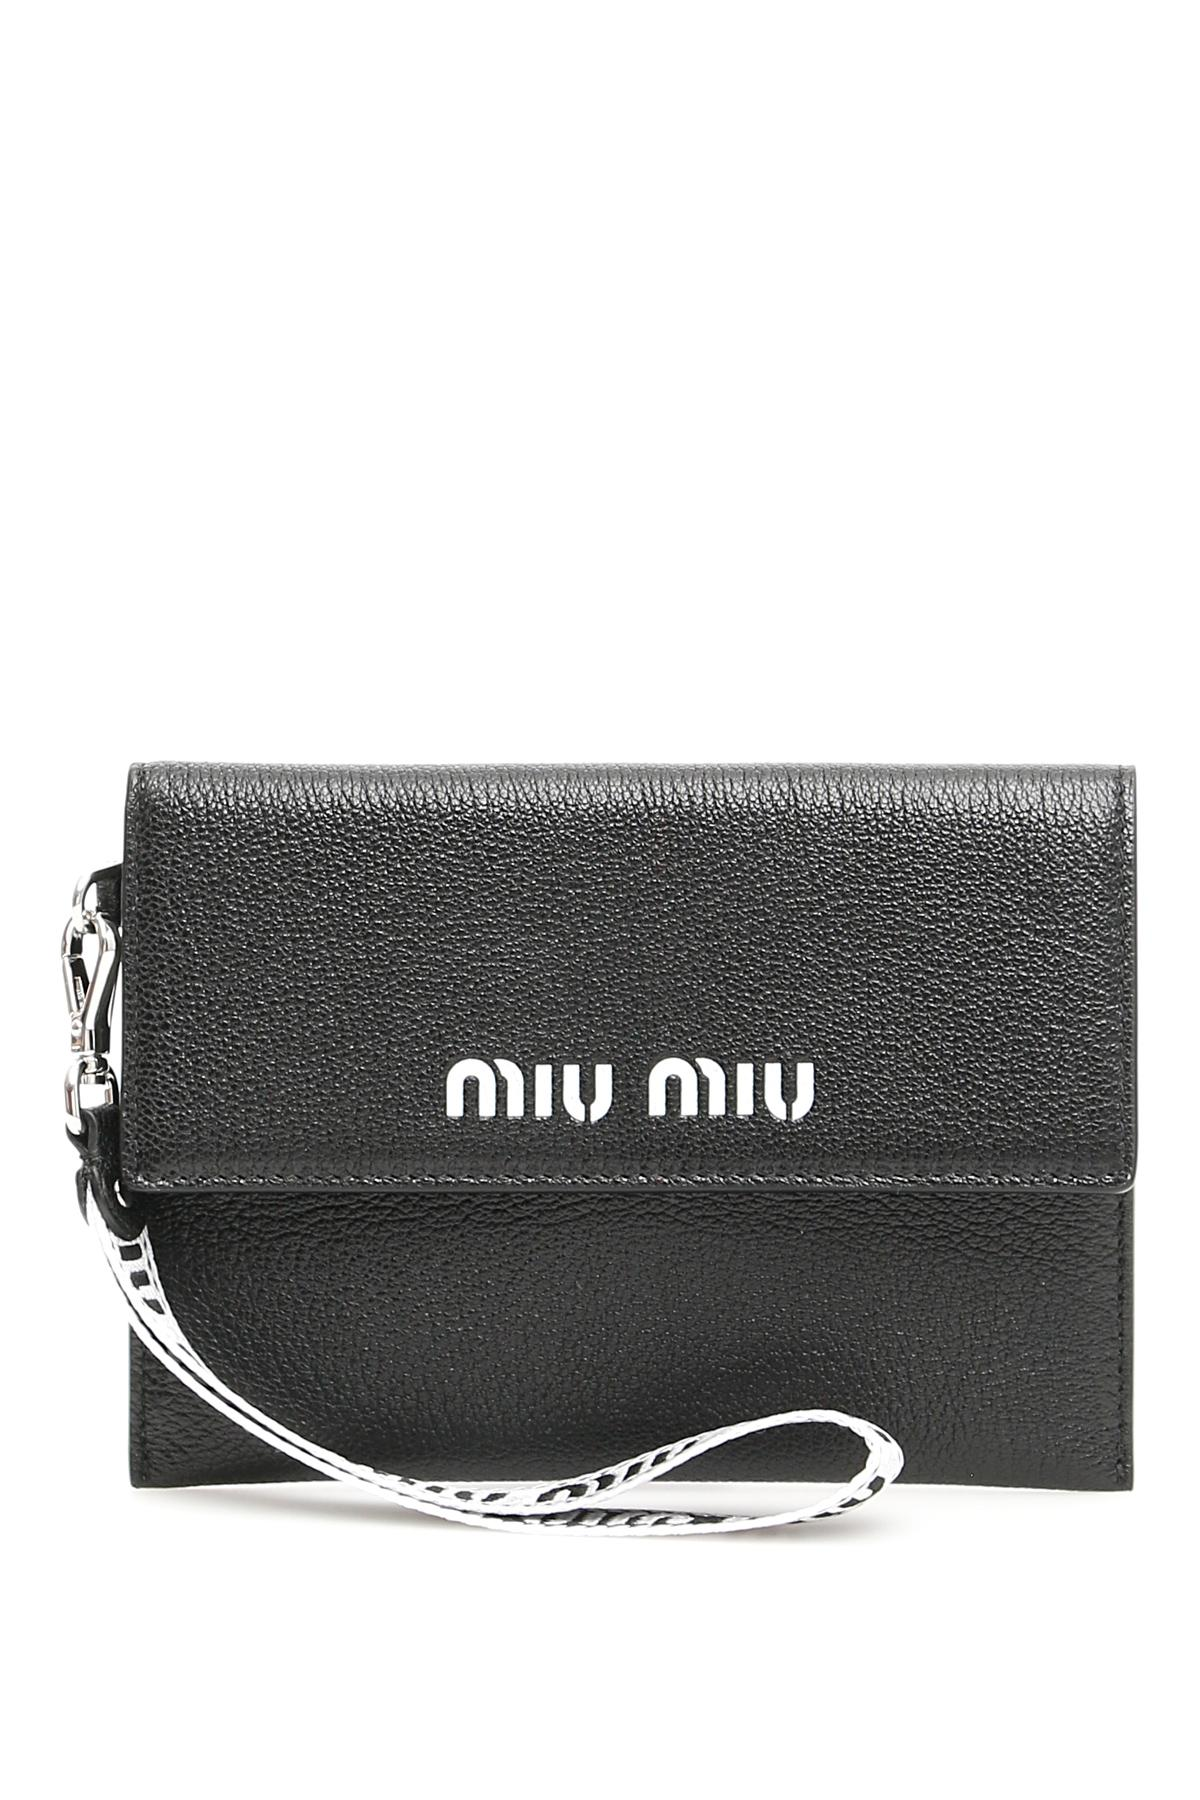 7970247018 Miu Miu Madras Pouch With Logo in Black - Lyst